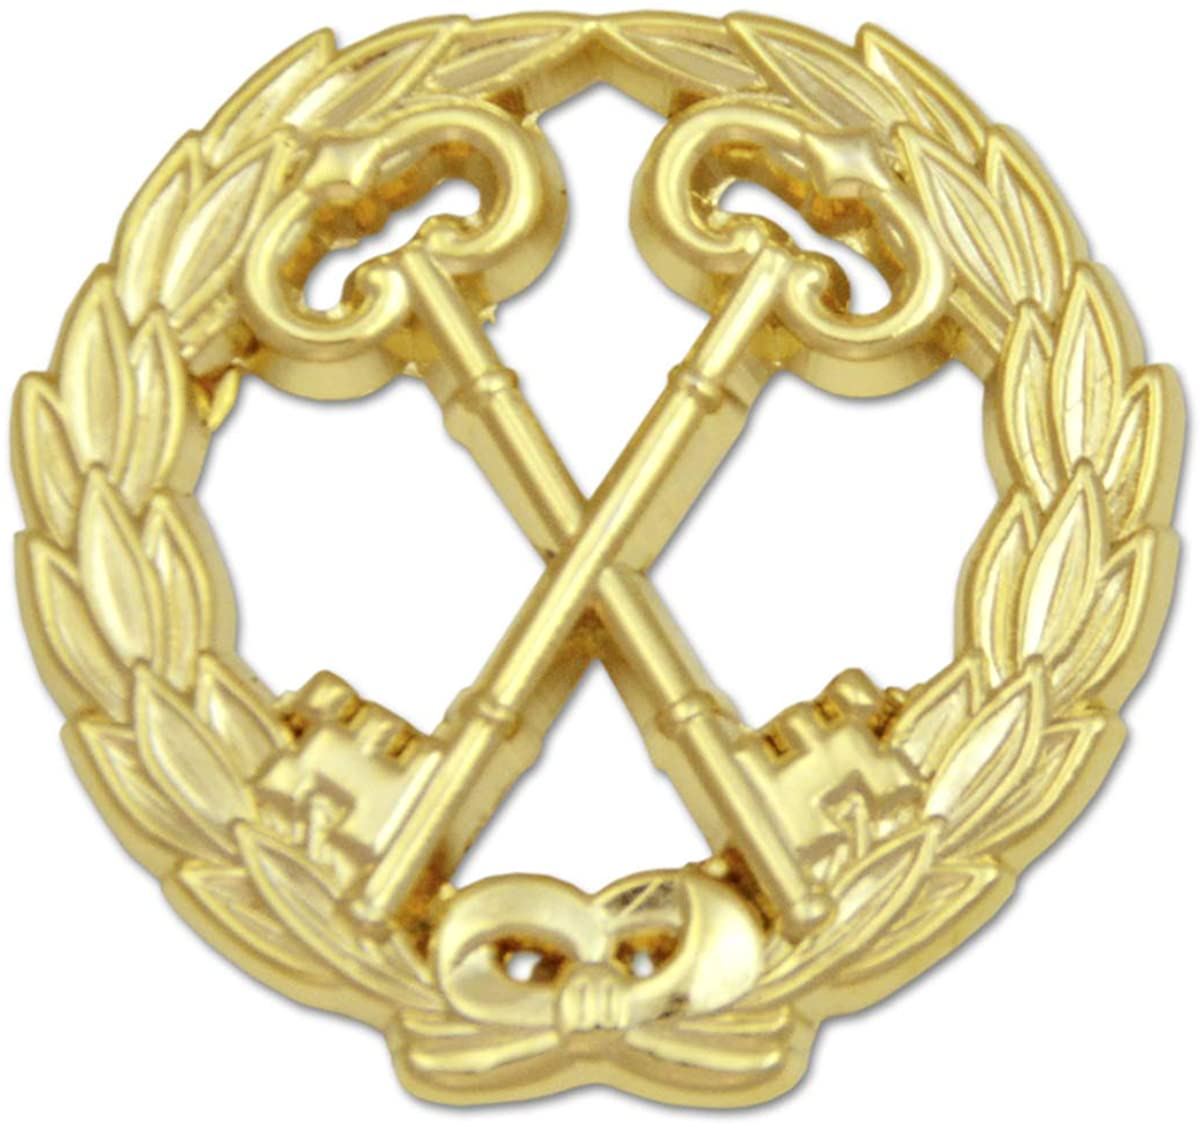 Wreathed Treasurer Keys Masonic Lapel Pin - [Gold][1 1/4'' Diameter]